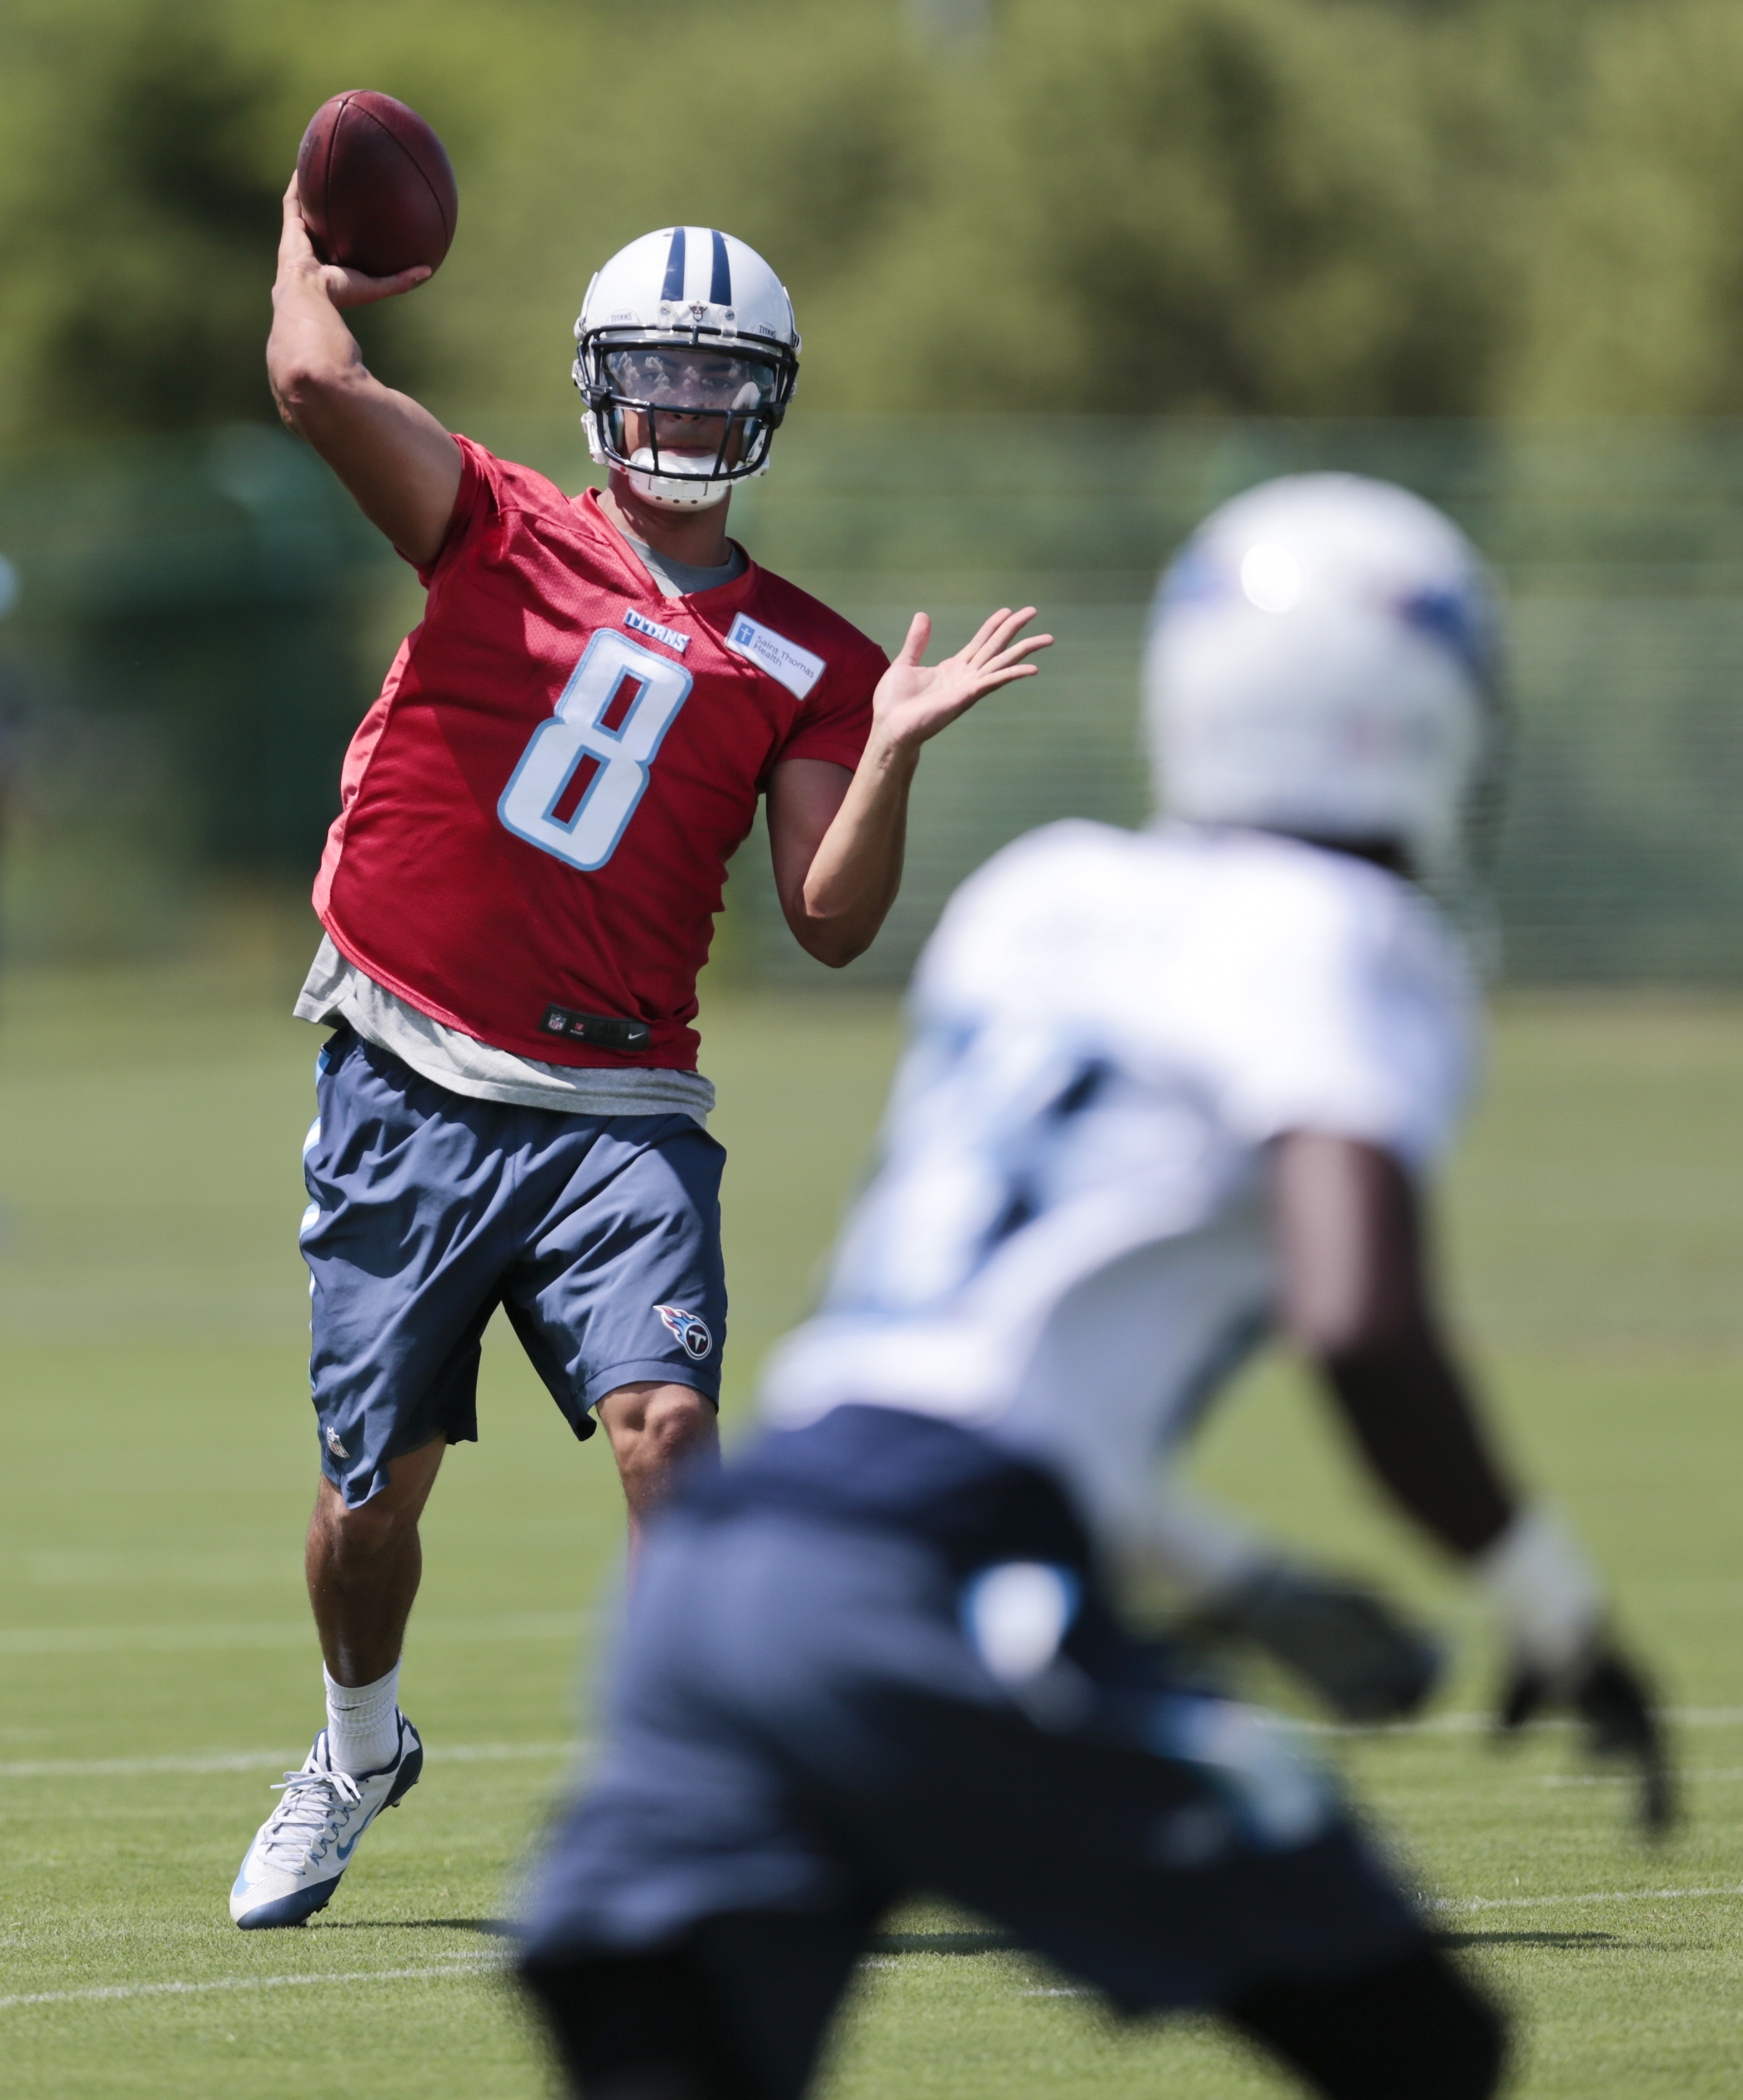 Tennessee Titans quarterback Marcus Mariota (8) passes during NFL football minicamp on Tuesday, June 16, 2015, in Nashville, Tenn. (AP Photo/Mark Humphrey)